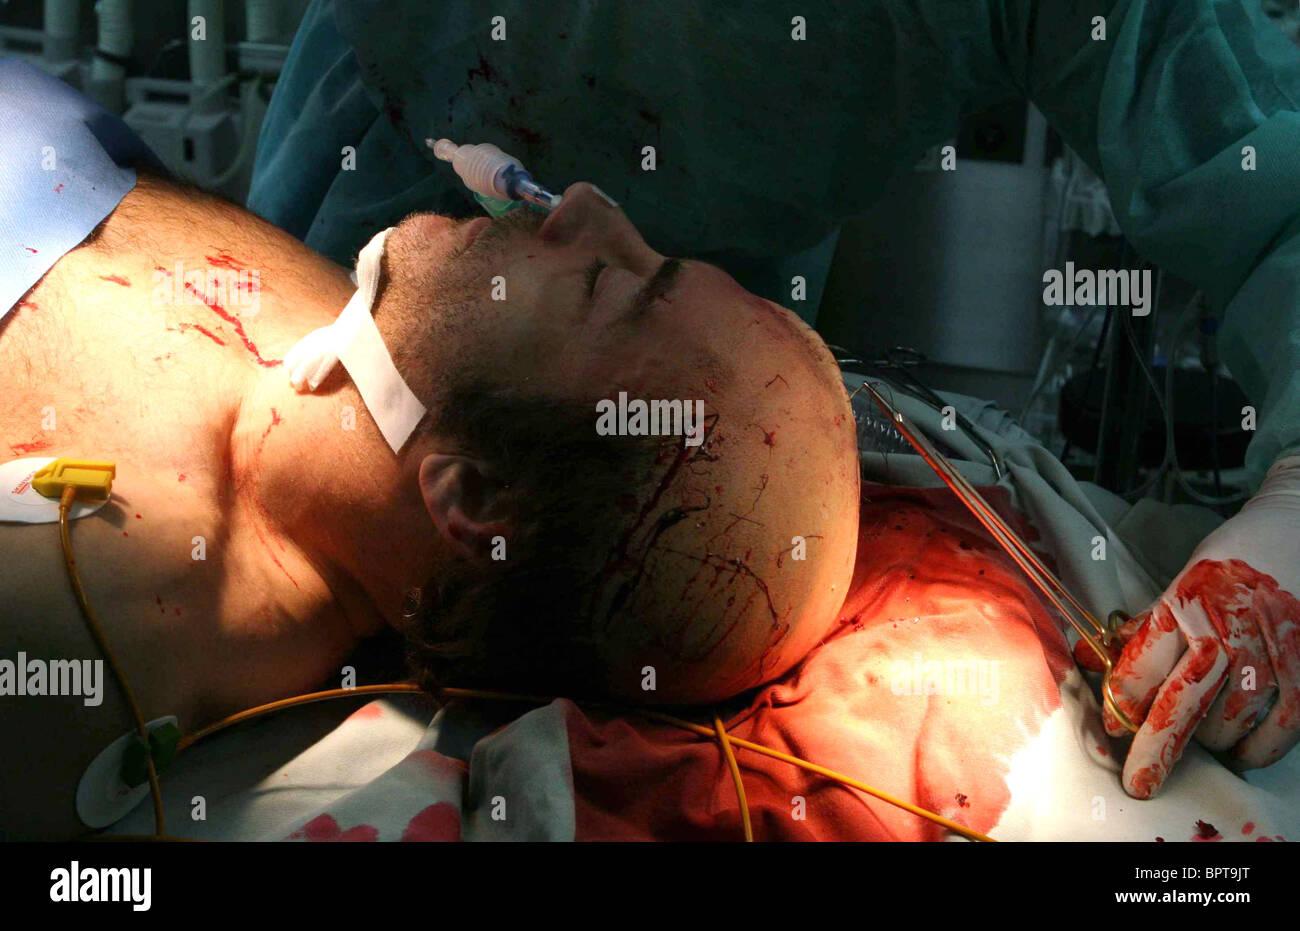 JEAN-CLAUDE VAN DAMME UNTIL DEATH (2007) - Stock Image